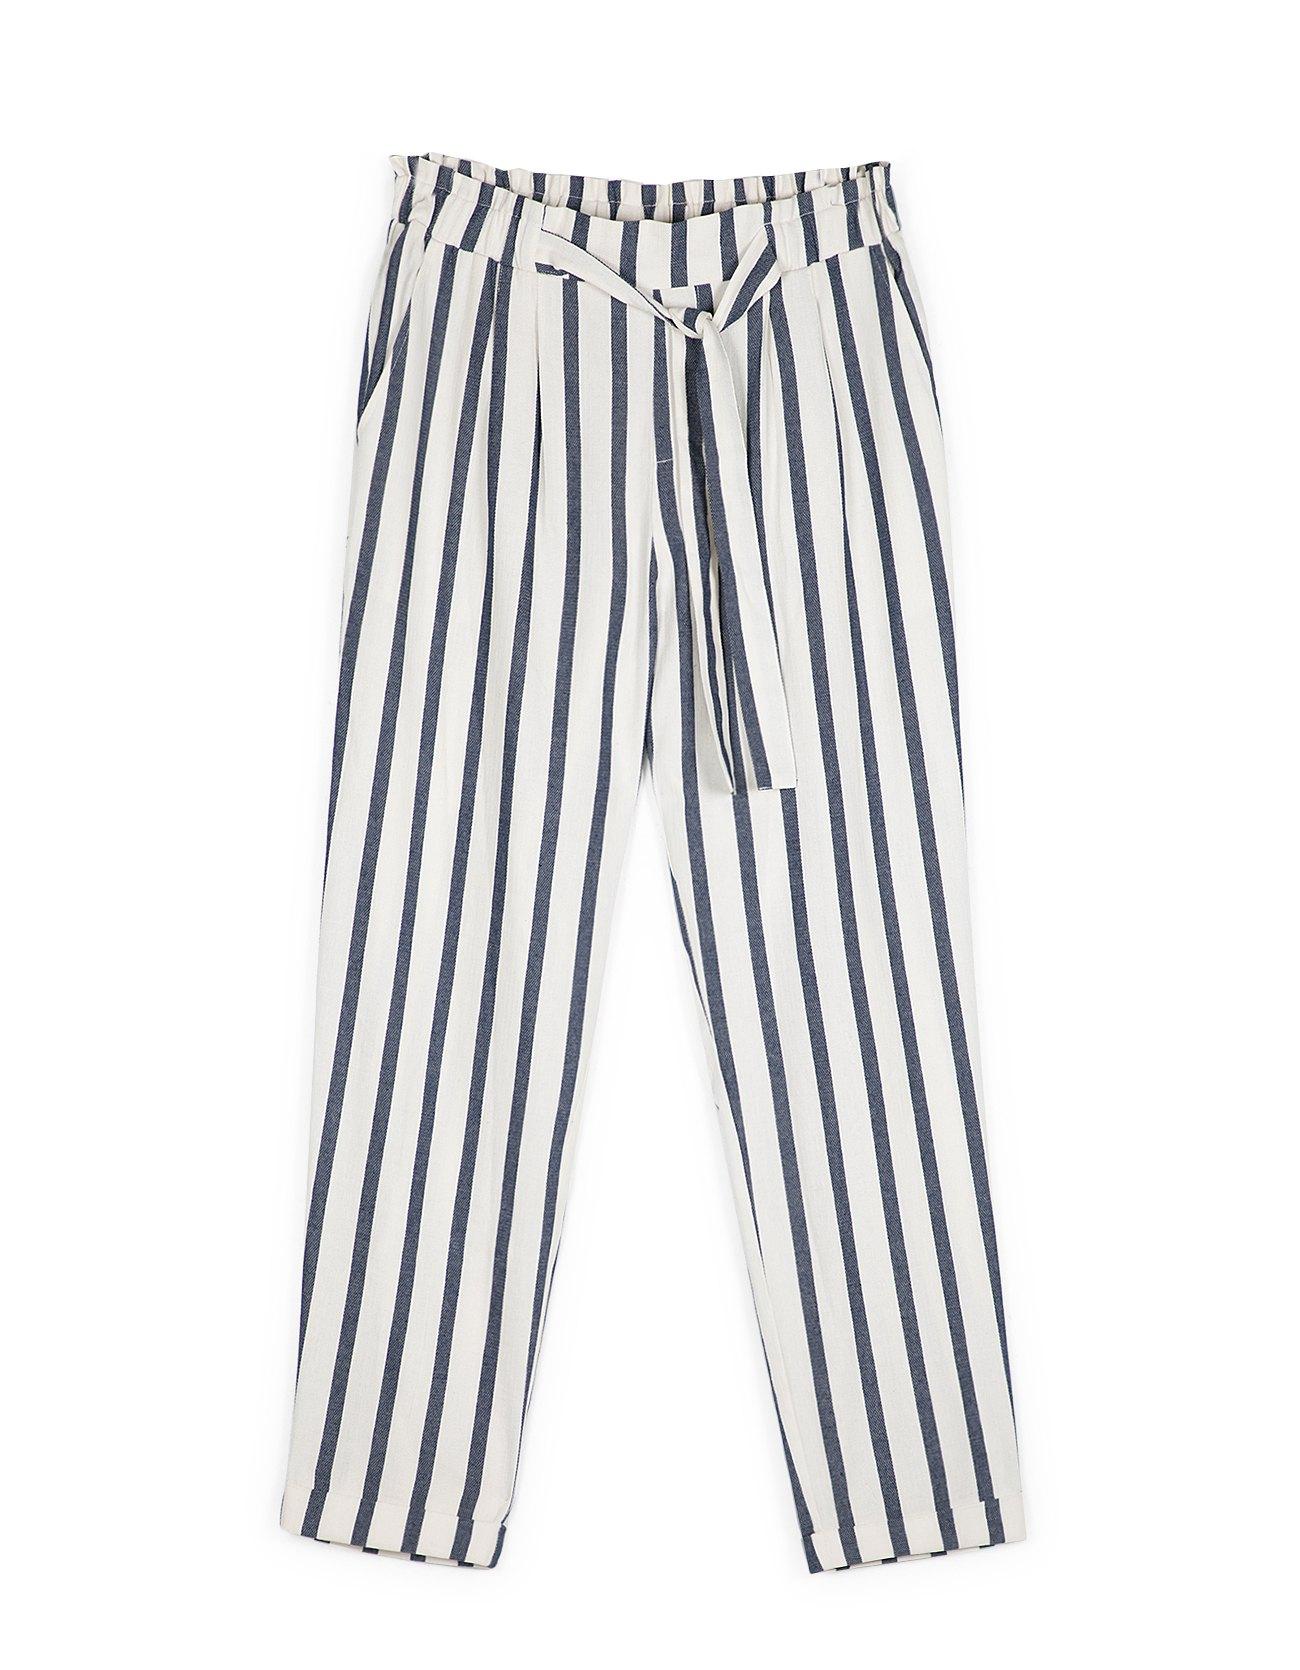 pantalon rayures stradivarius 20 pantalons pour. Black Bedroom Furniture Sets. Home Design Ideas